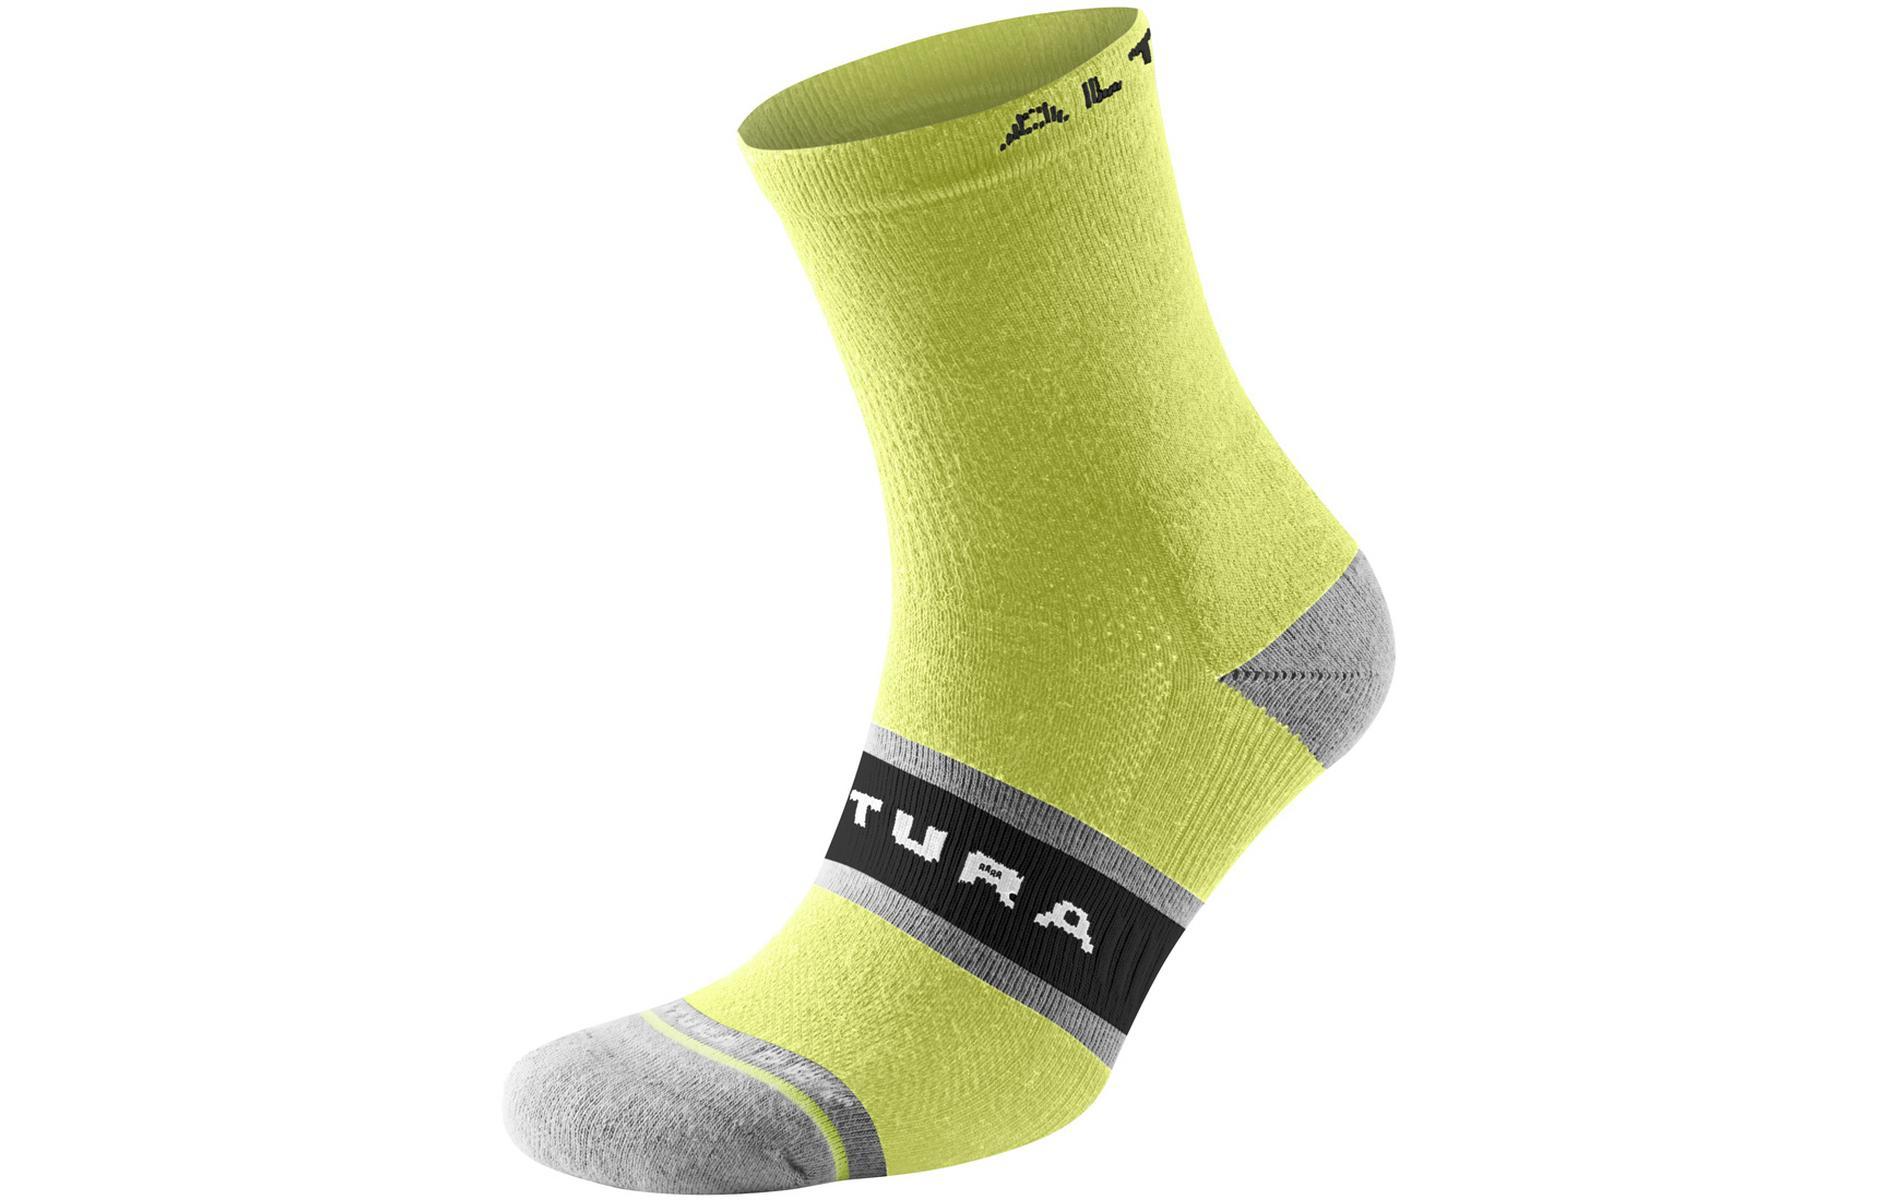 Altura Dry Elite Socks, Fluro, 7-9